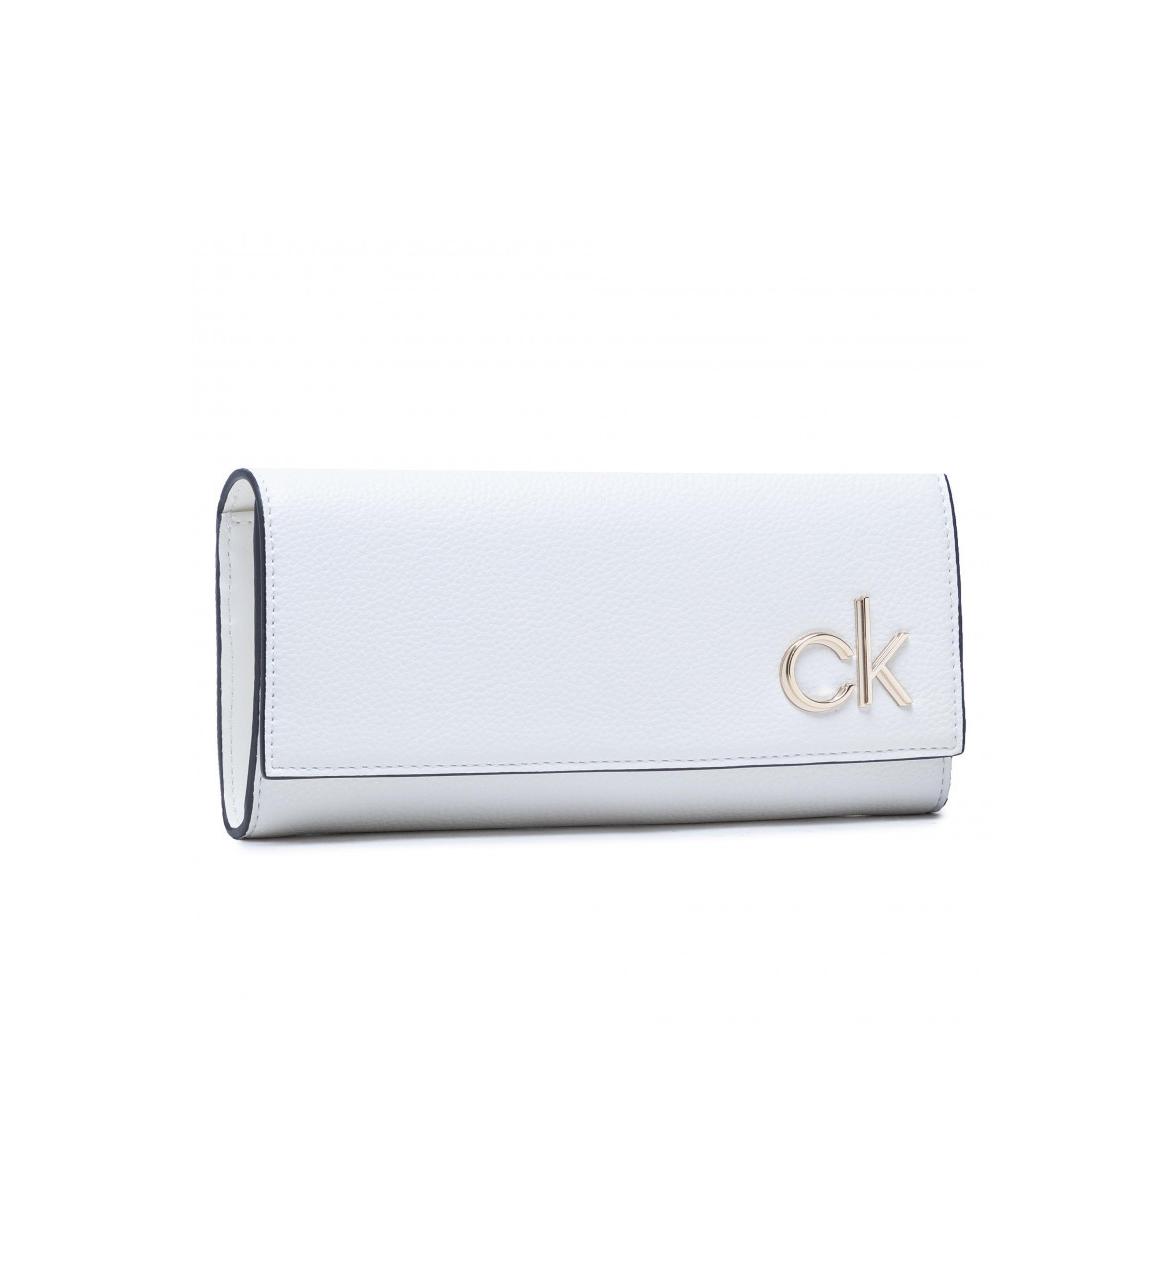 Calvin Klein Calvin Klein dámská bílá peněženka s klopou TRIFOLD LG